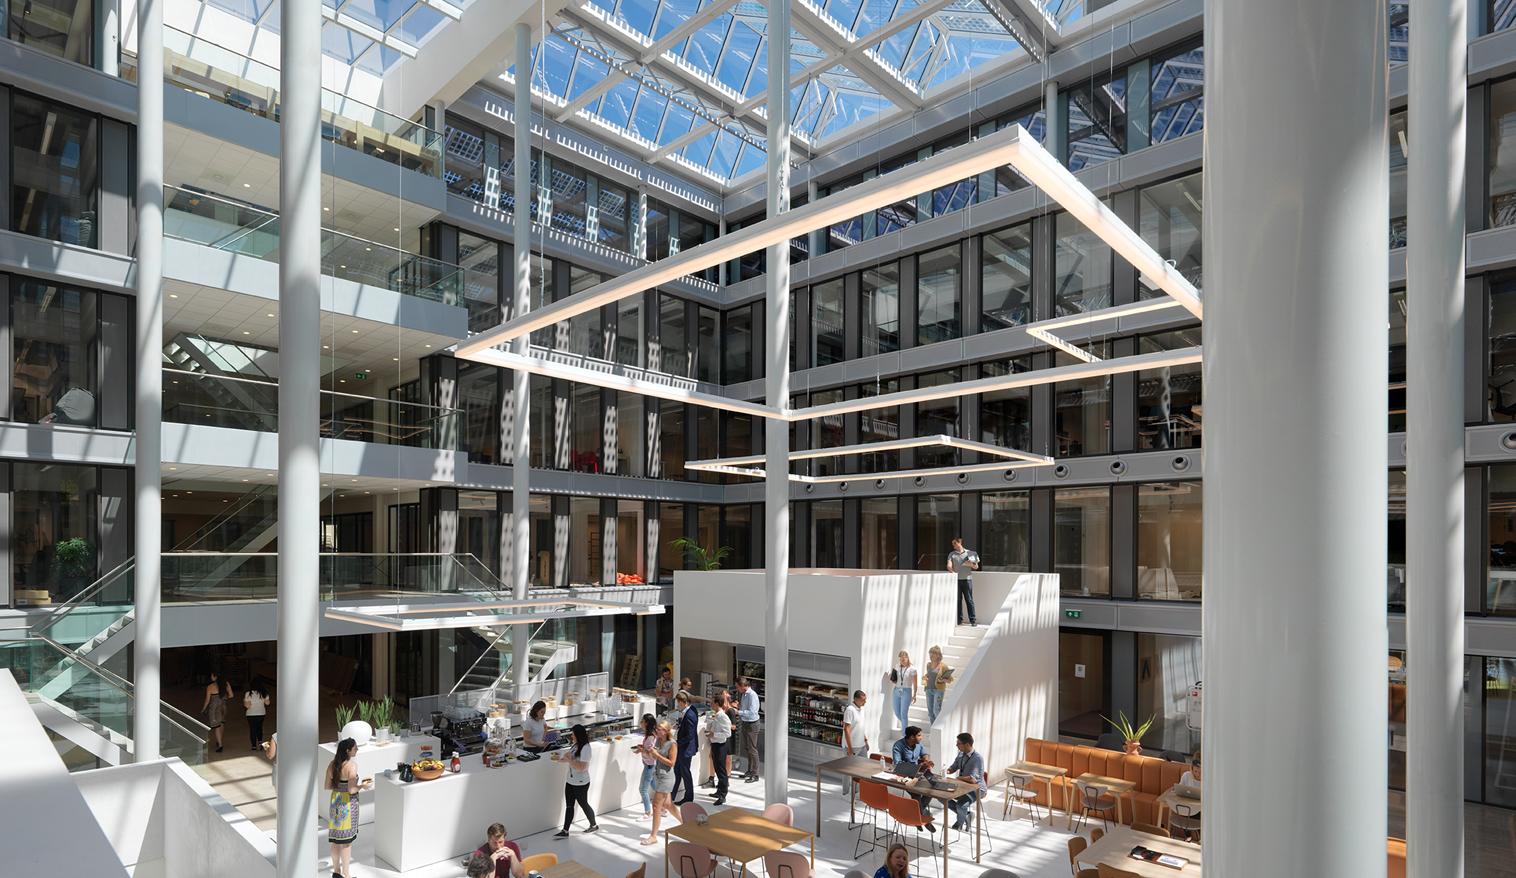 07 OPL Architecten_The Cloud Amsterdam-1516×878-72dpi